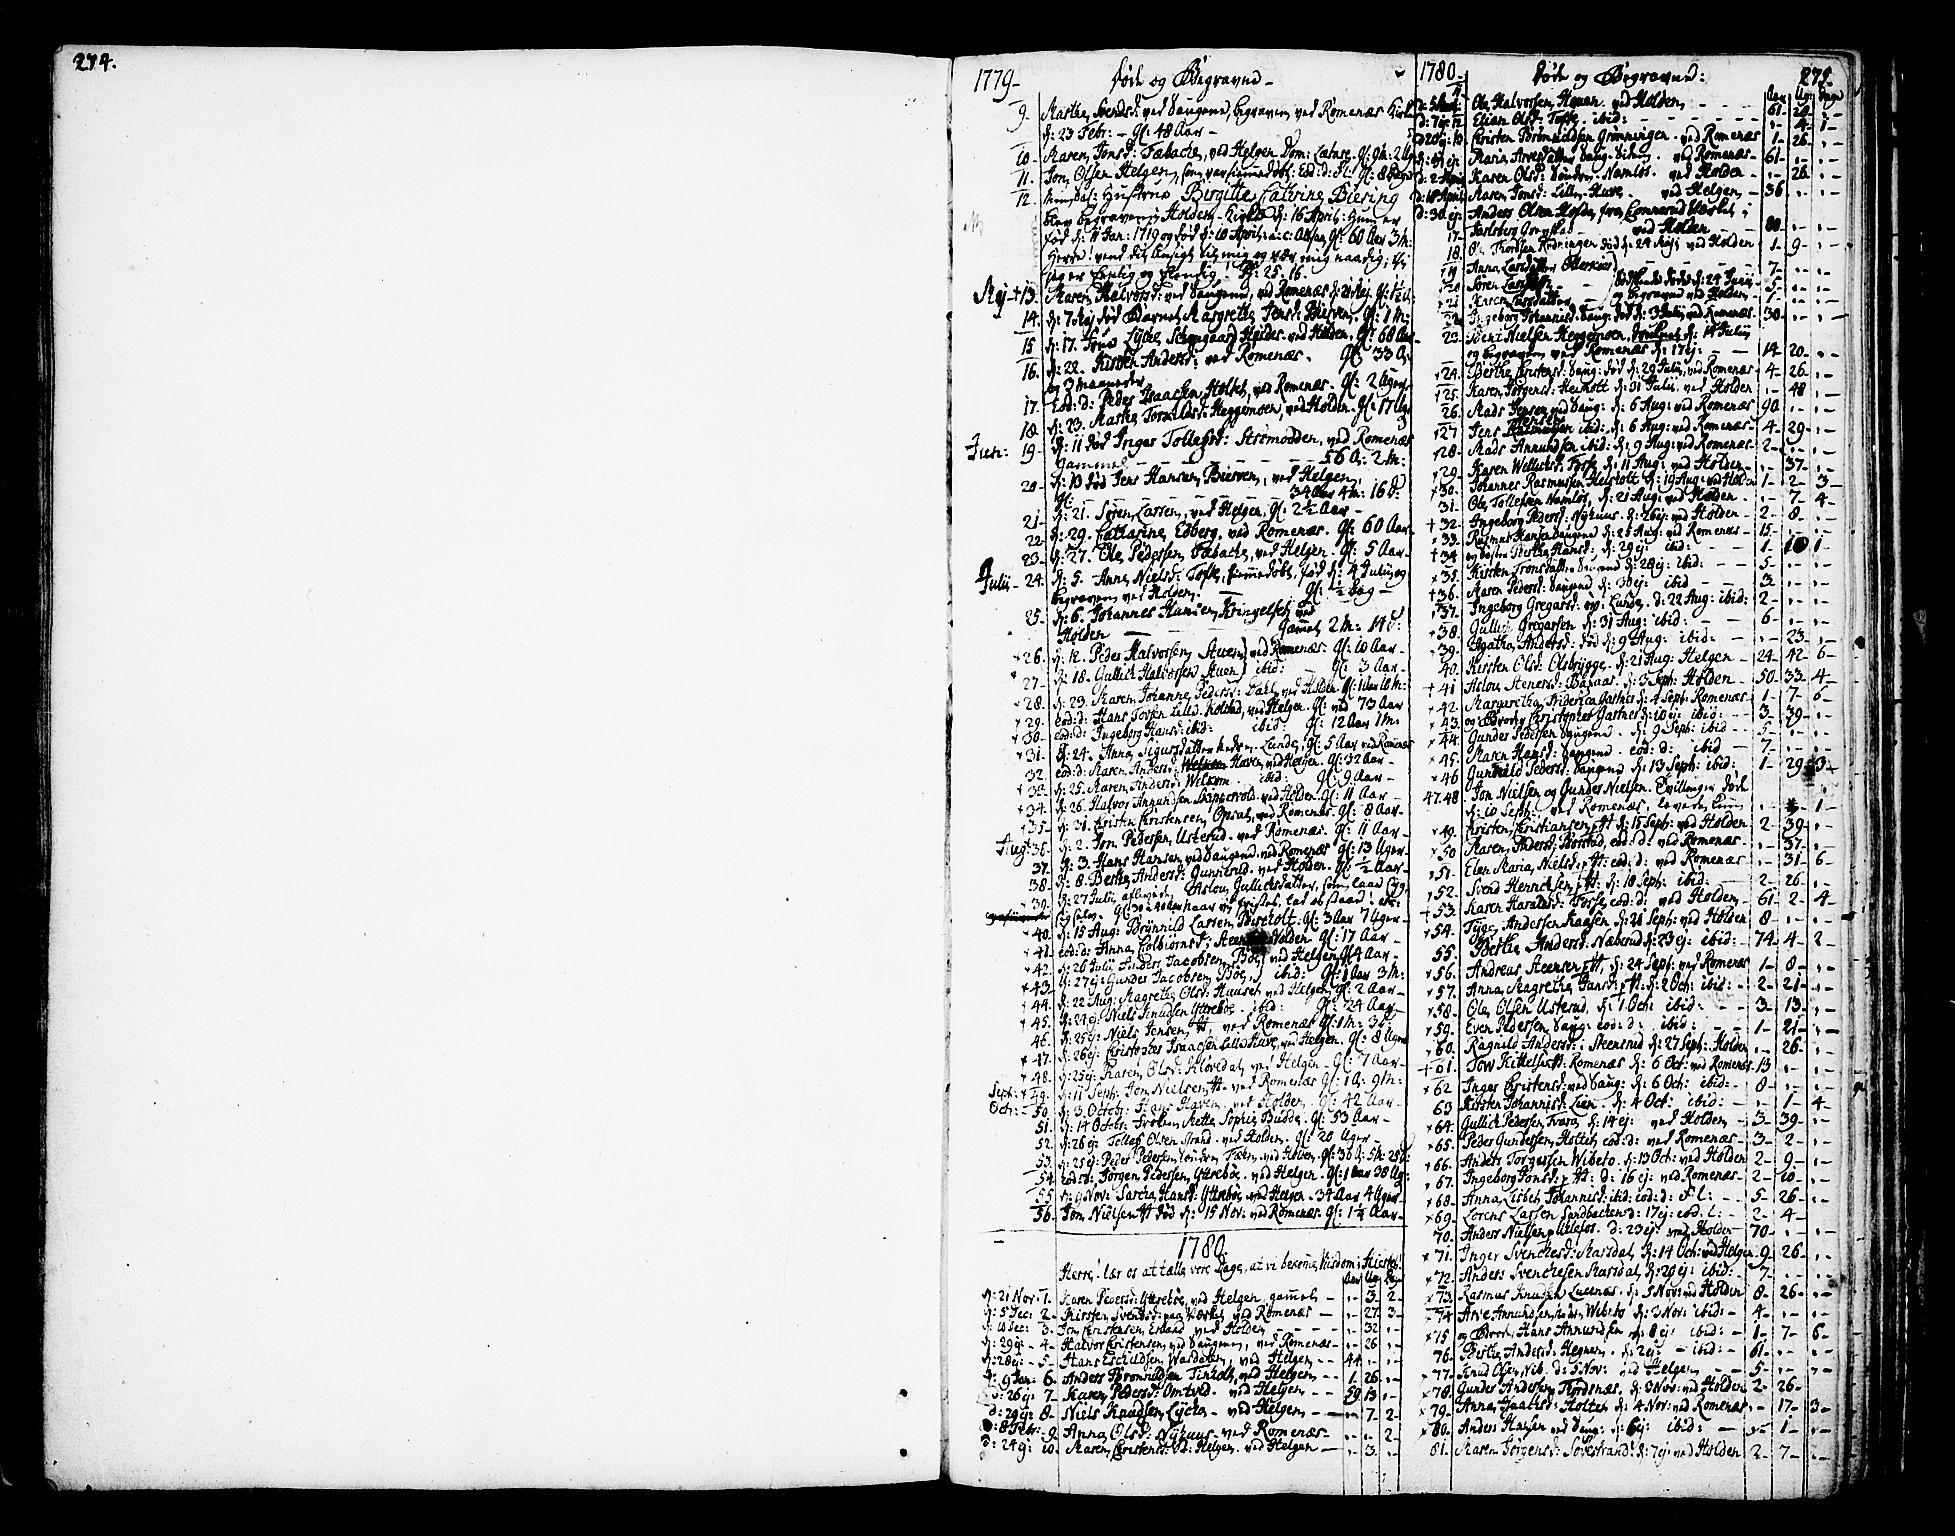 SAKO, Holla kirkebøker, F/Fa/L0002: Ministerialbok nr. 2, 1779-1814, s. 274-275